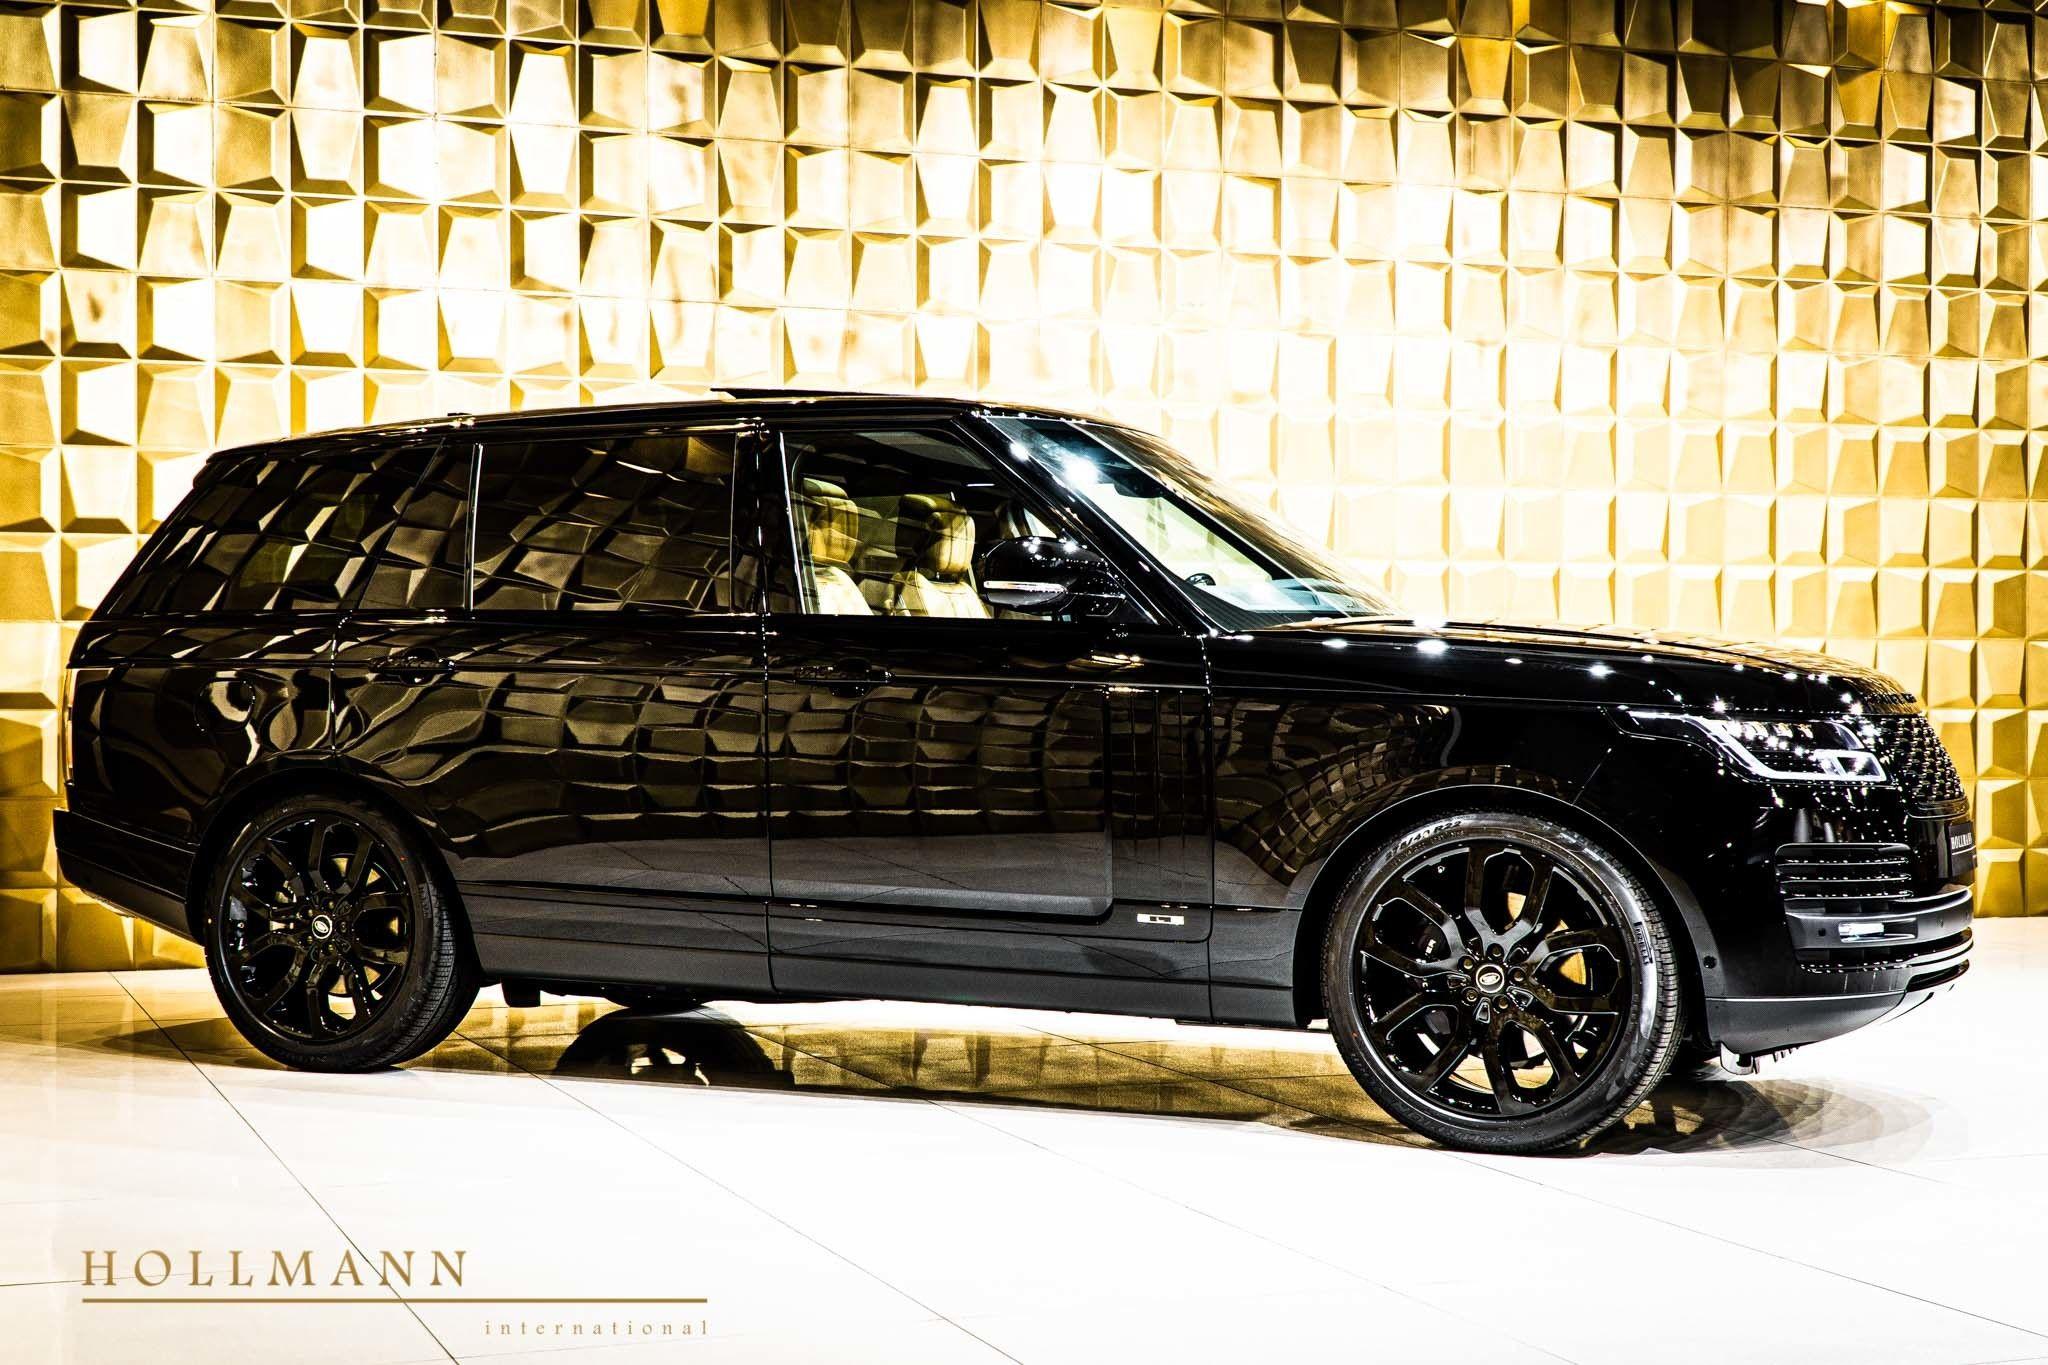 For Sale Range Rover 3 0 Sdv6 Autobiography Lwb Hollmann International Germany For Sale On Luxurypulse Range Rover Range Rover Supercharged Dream Cars